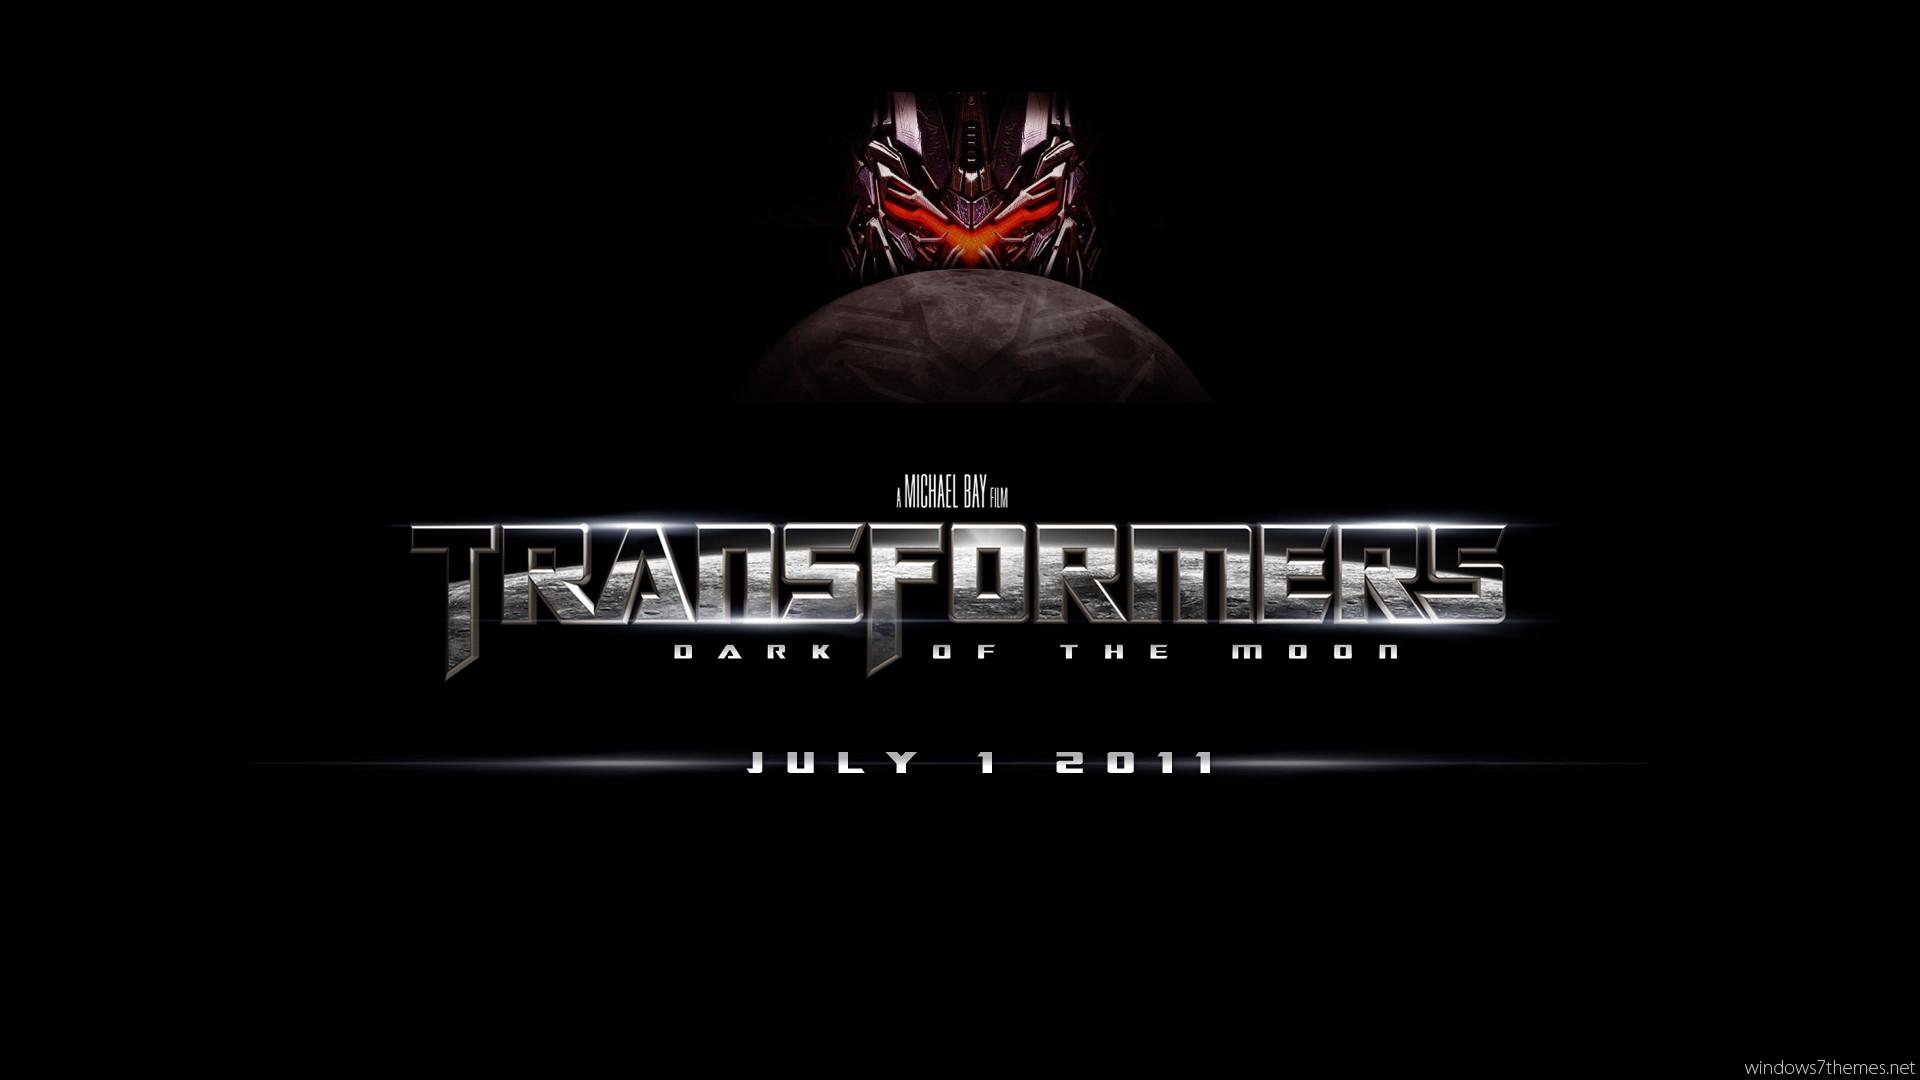 Download Transformers 3 Wallpaper 1